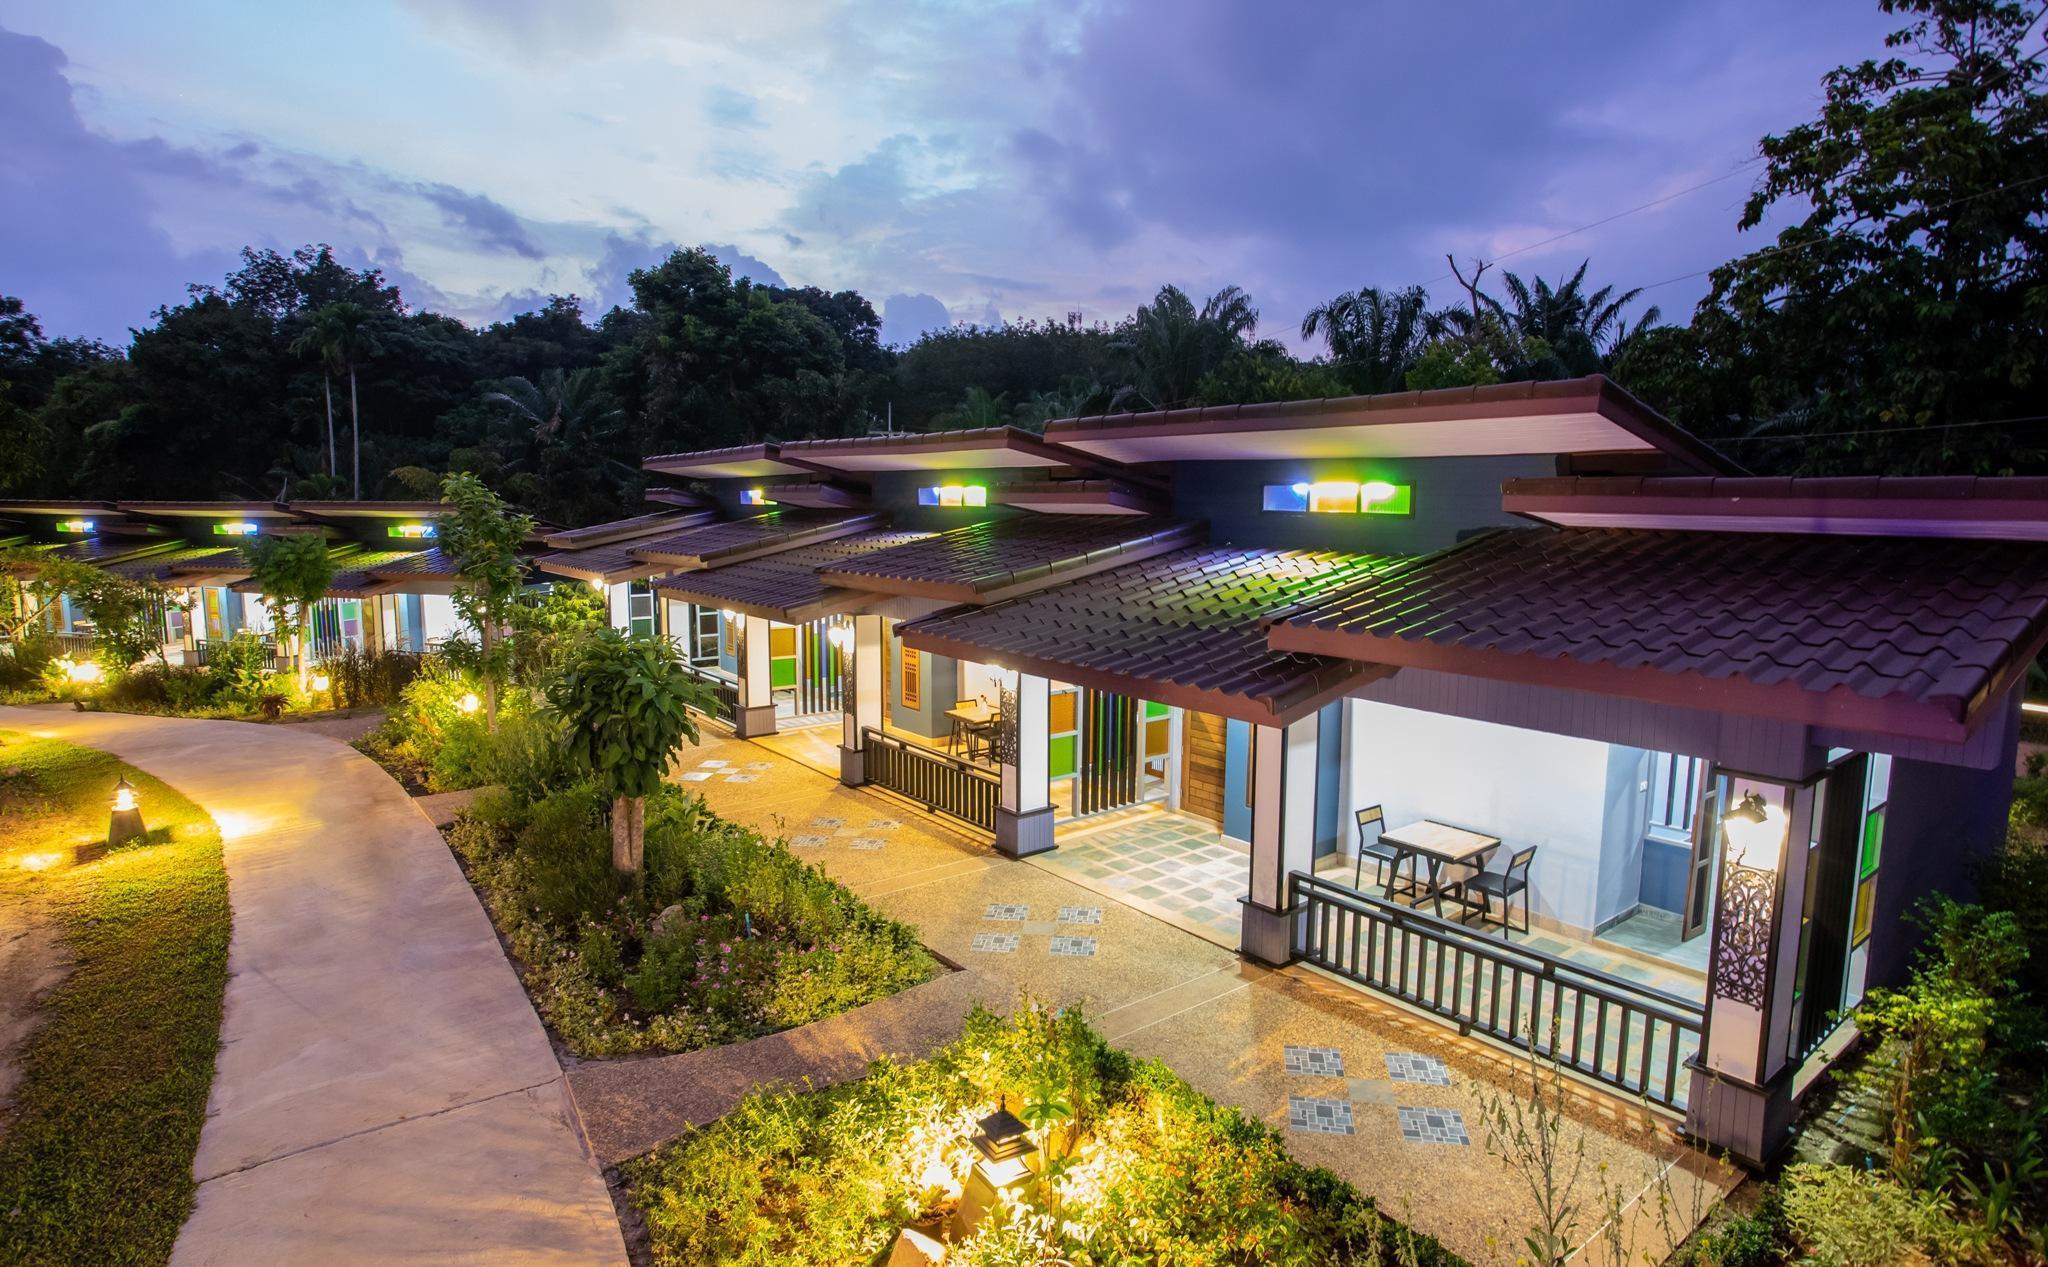 Loft Vintage Chalet resort ลอฟต์ วินเทจ ชาเลต์ รีสอร์ต